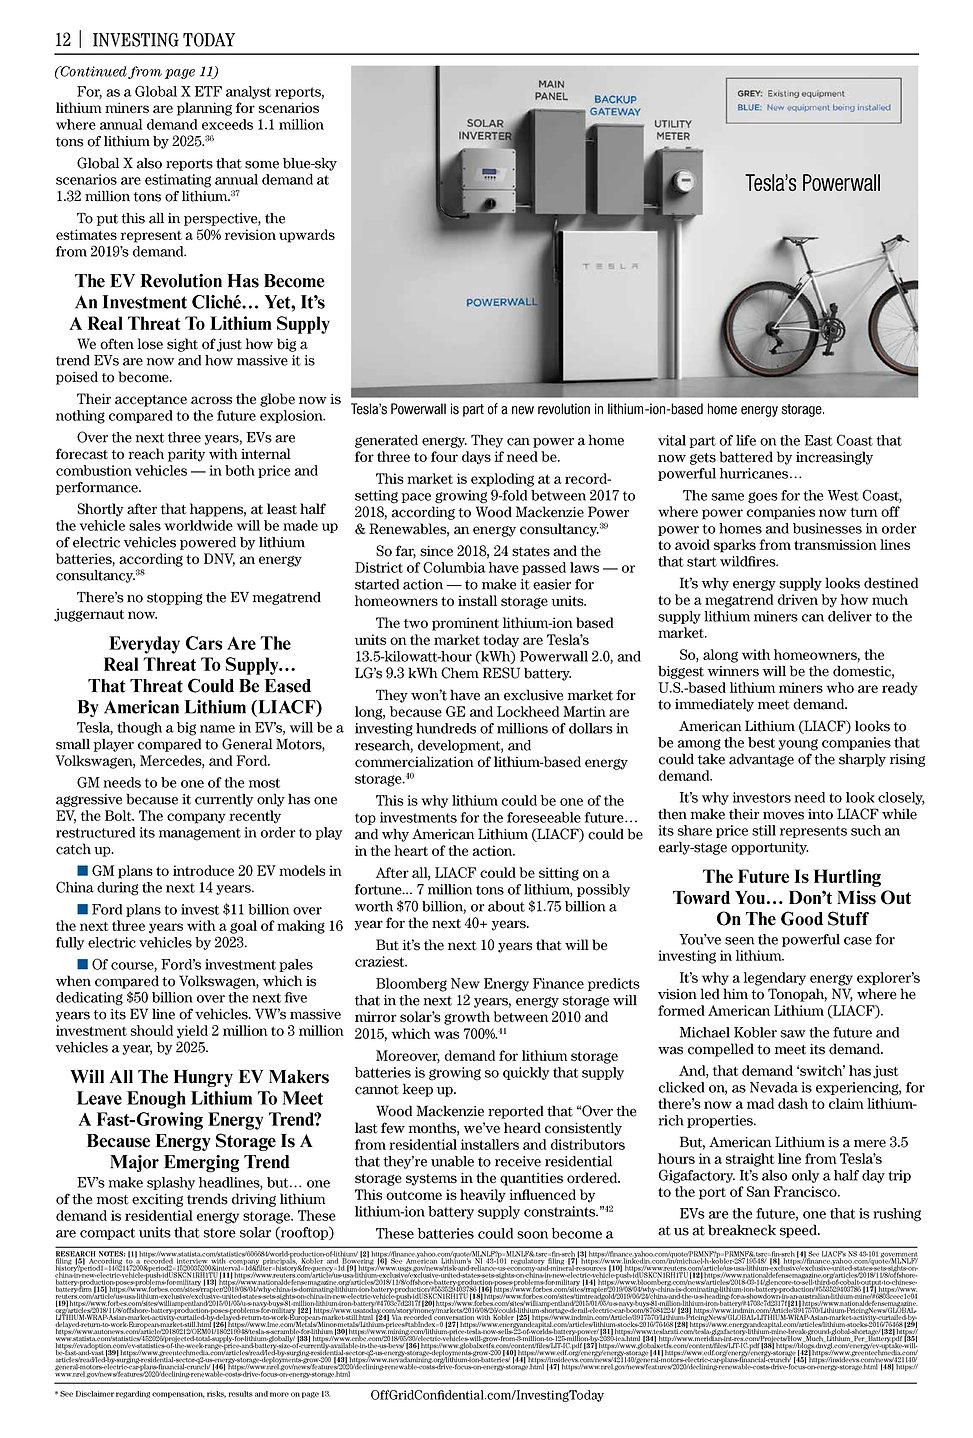 LIACF Newsalog_Page_12.jpg